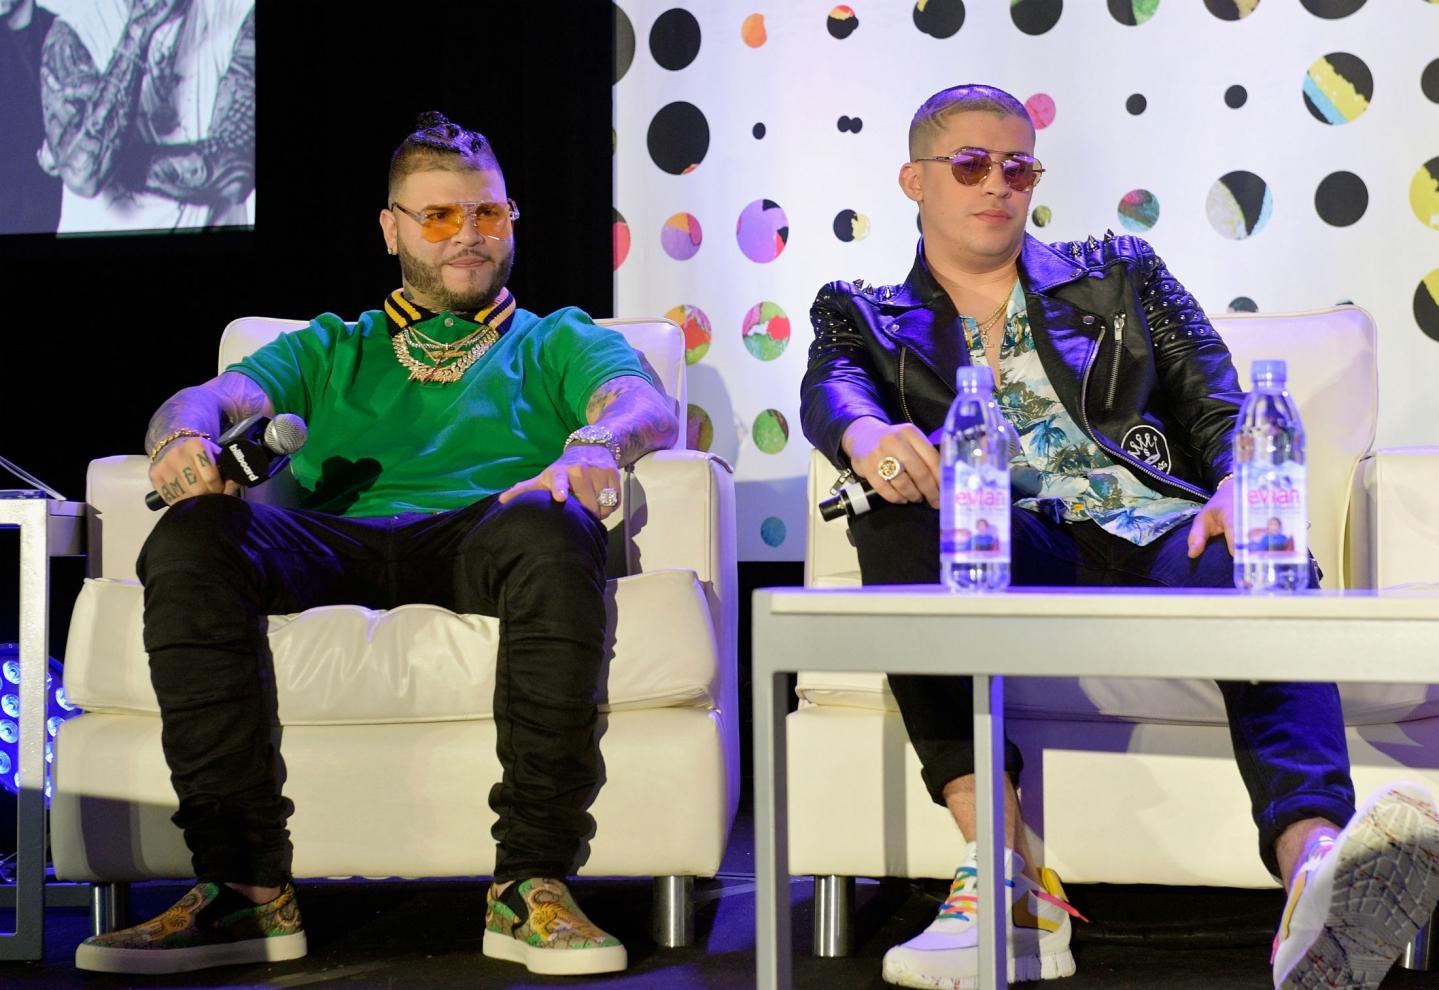 República Dominicana prohibe la música de Bad Bunny